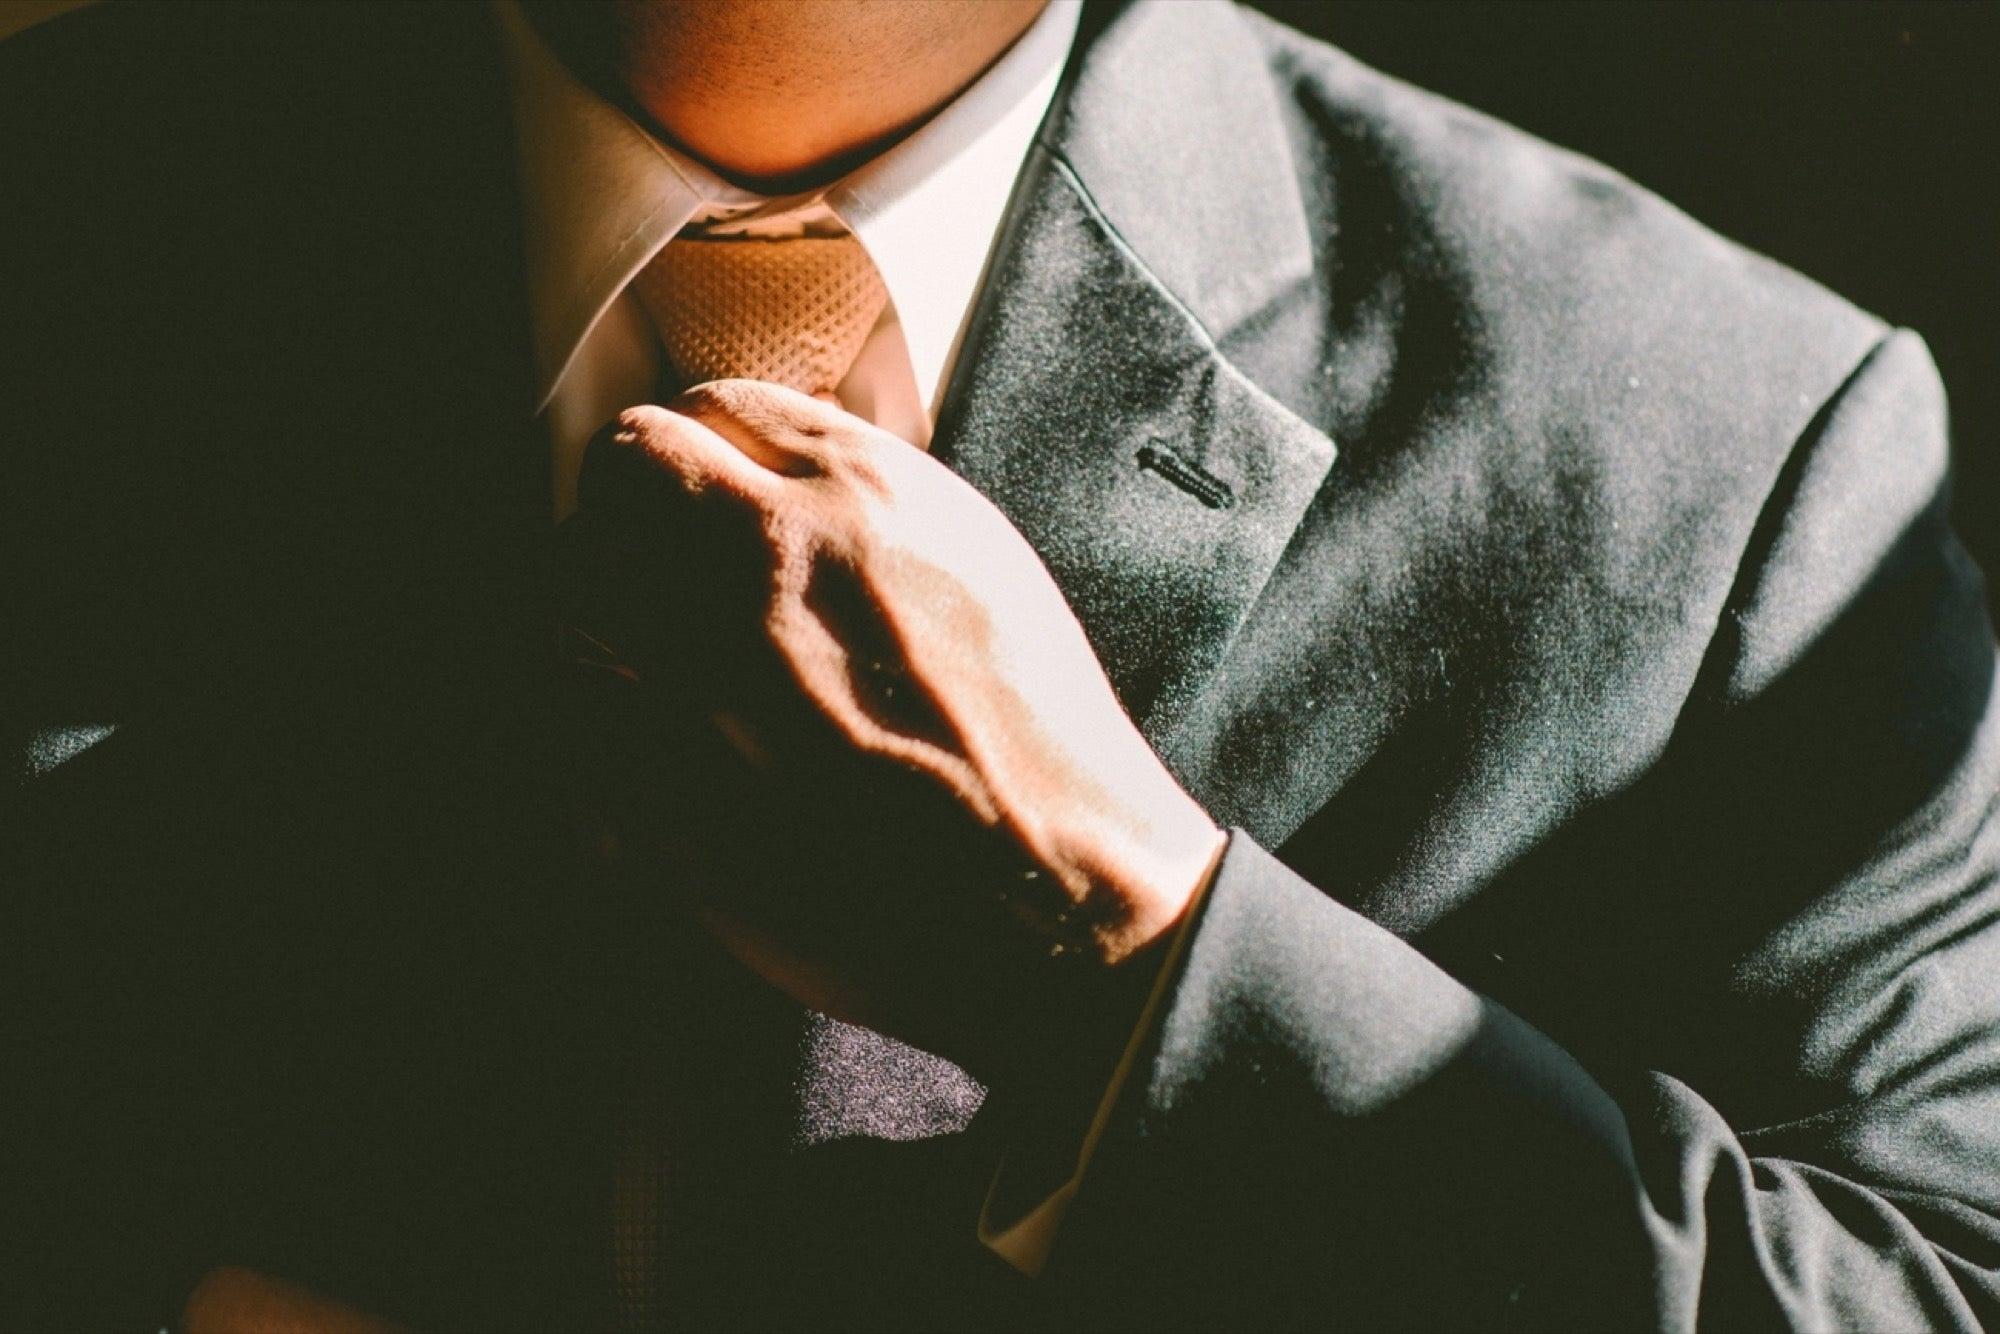 20151112144152-smooth-operator-man-businessman-suit-classy-confident-professional.jpeg